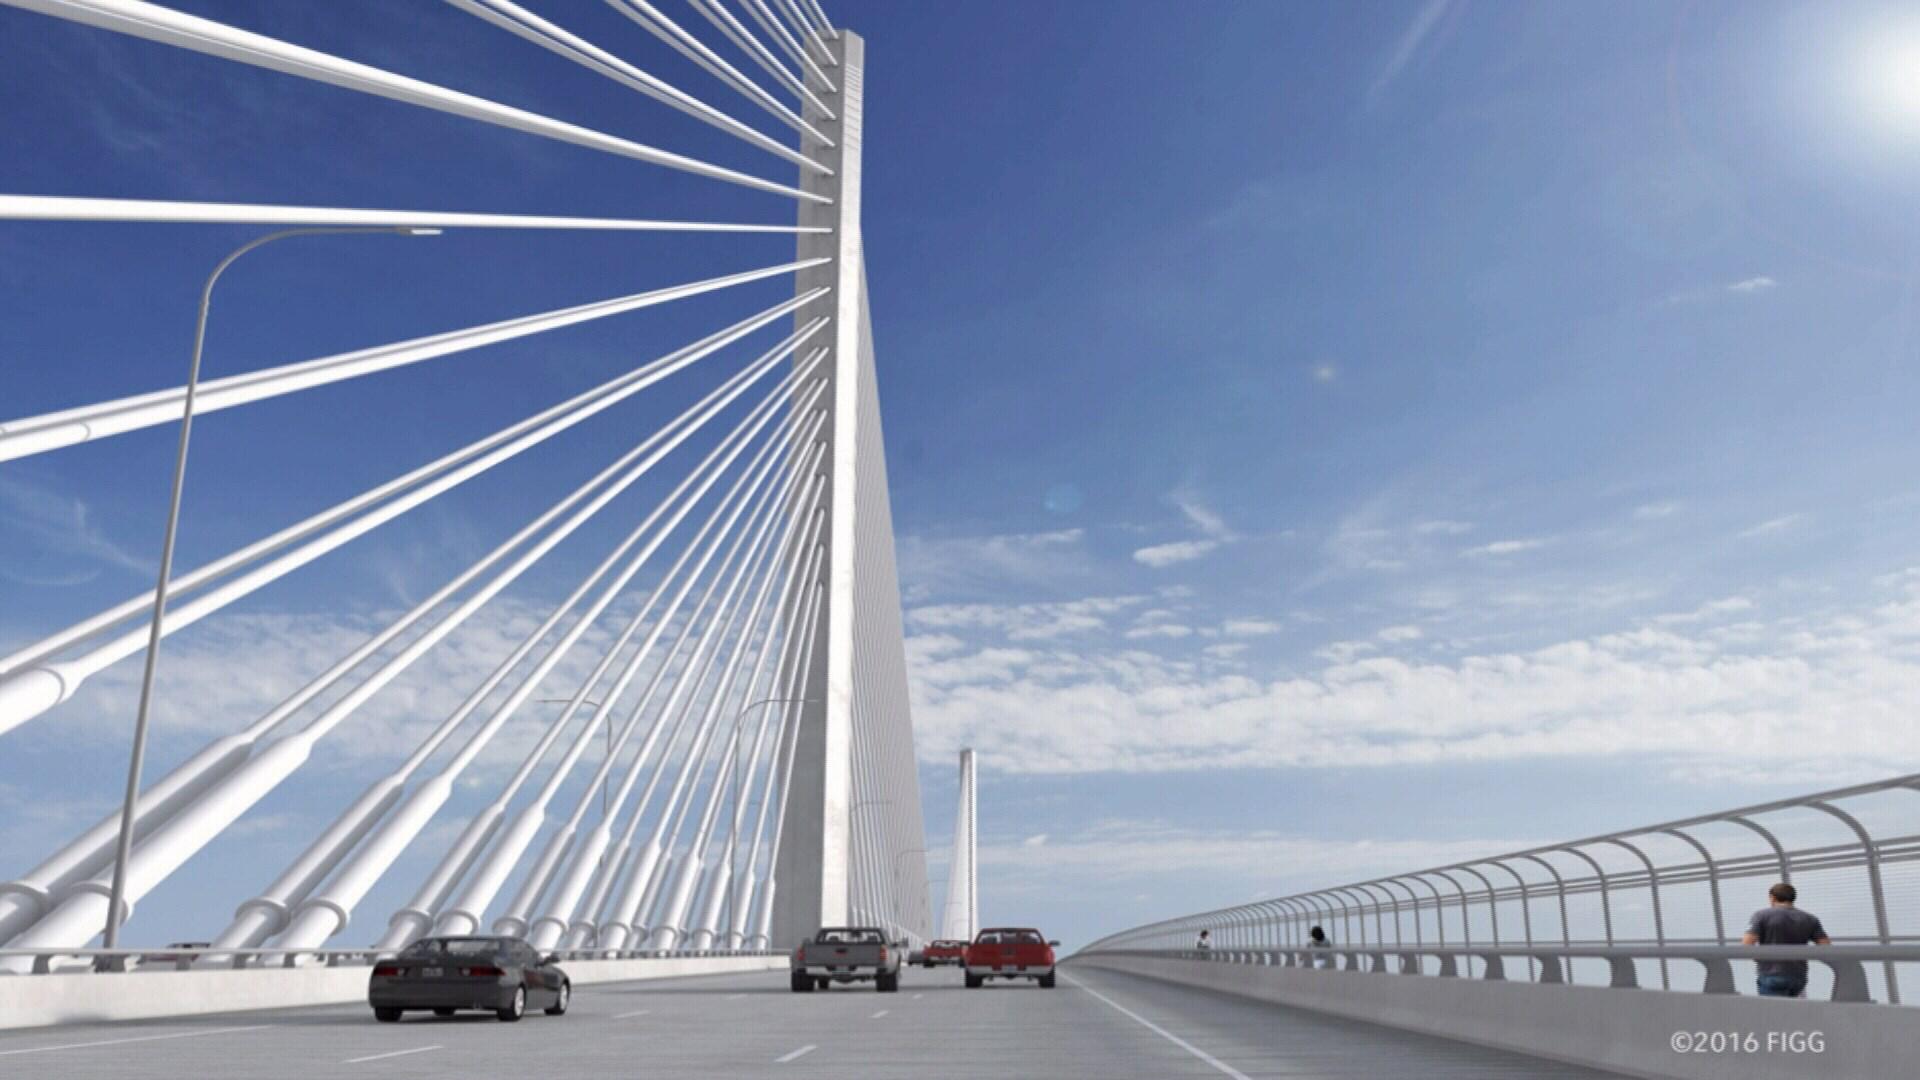 FIU prepares for classes and memorials to bridge collapse victims